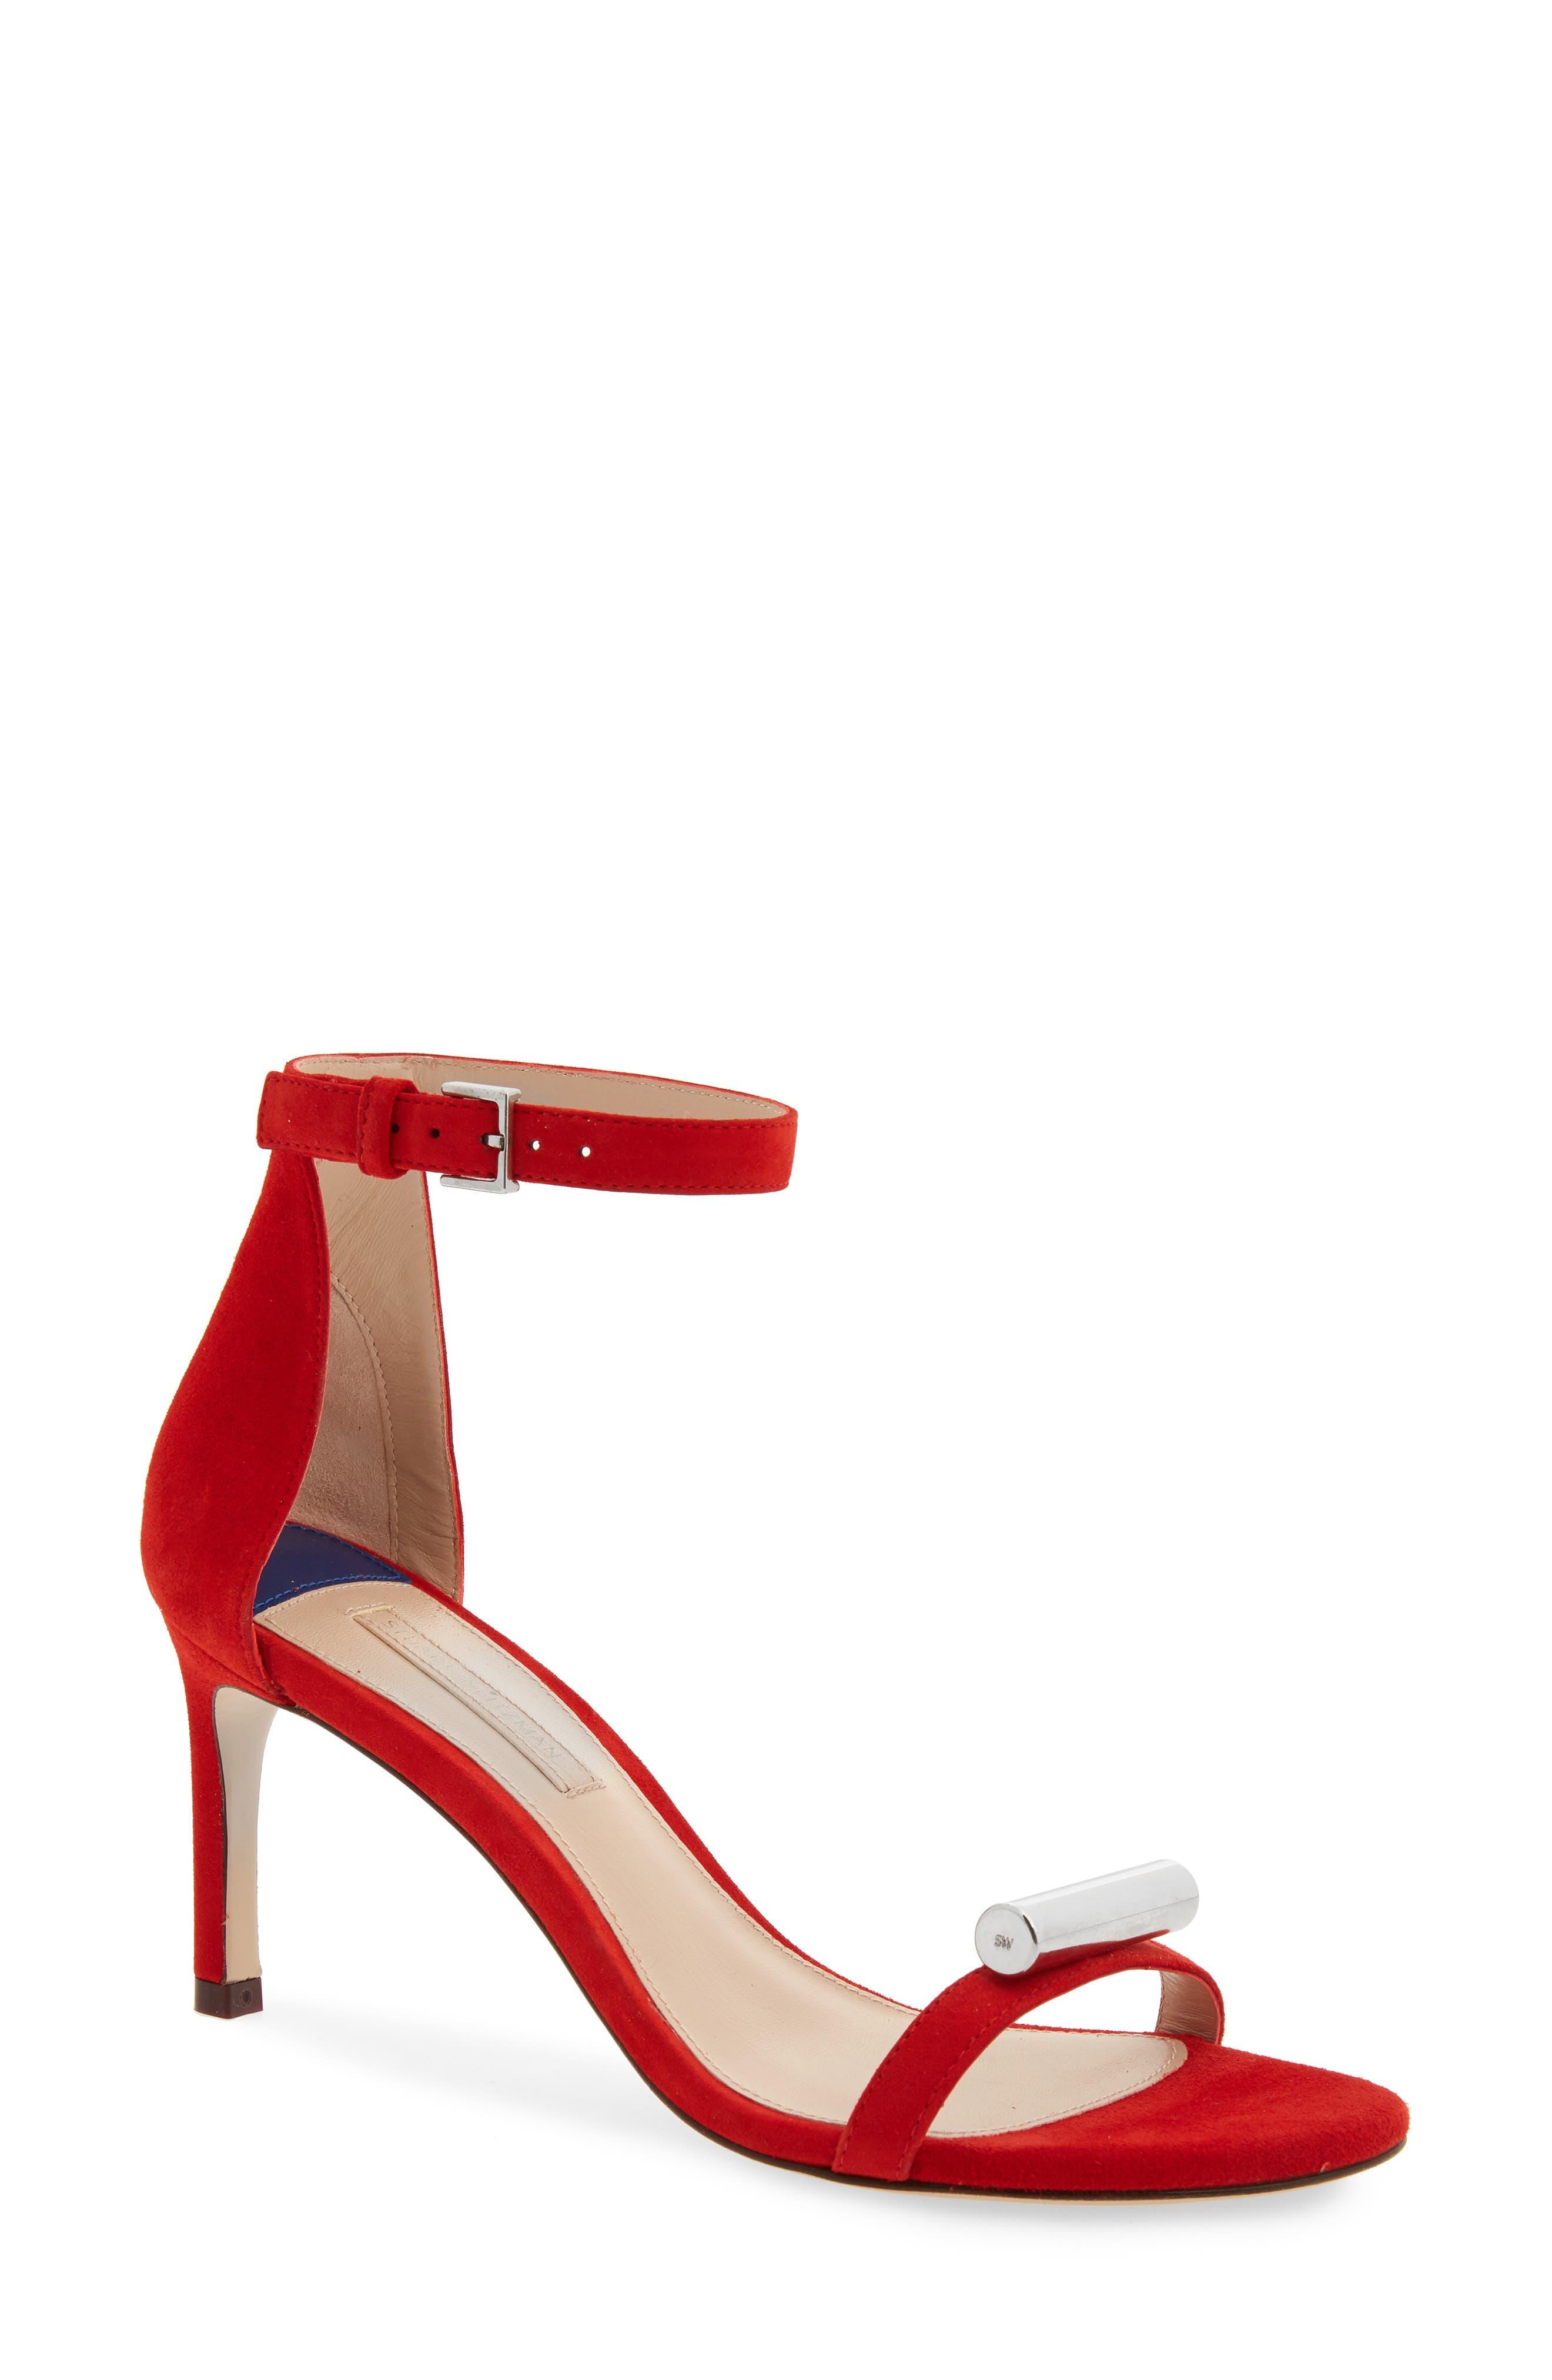 Stuart Weitzman Cylinder Sandal, Red